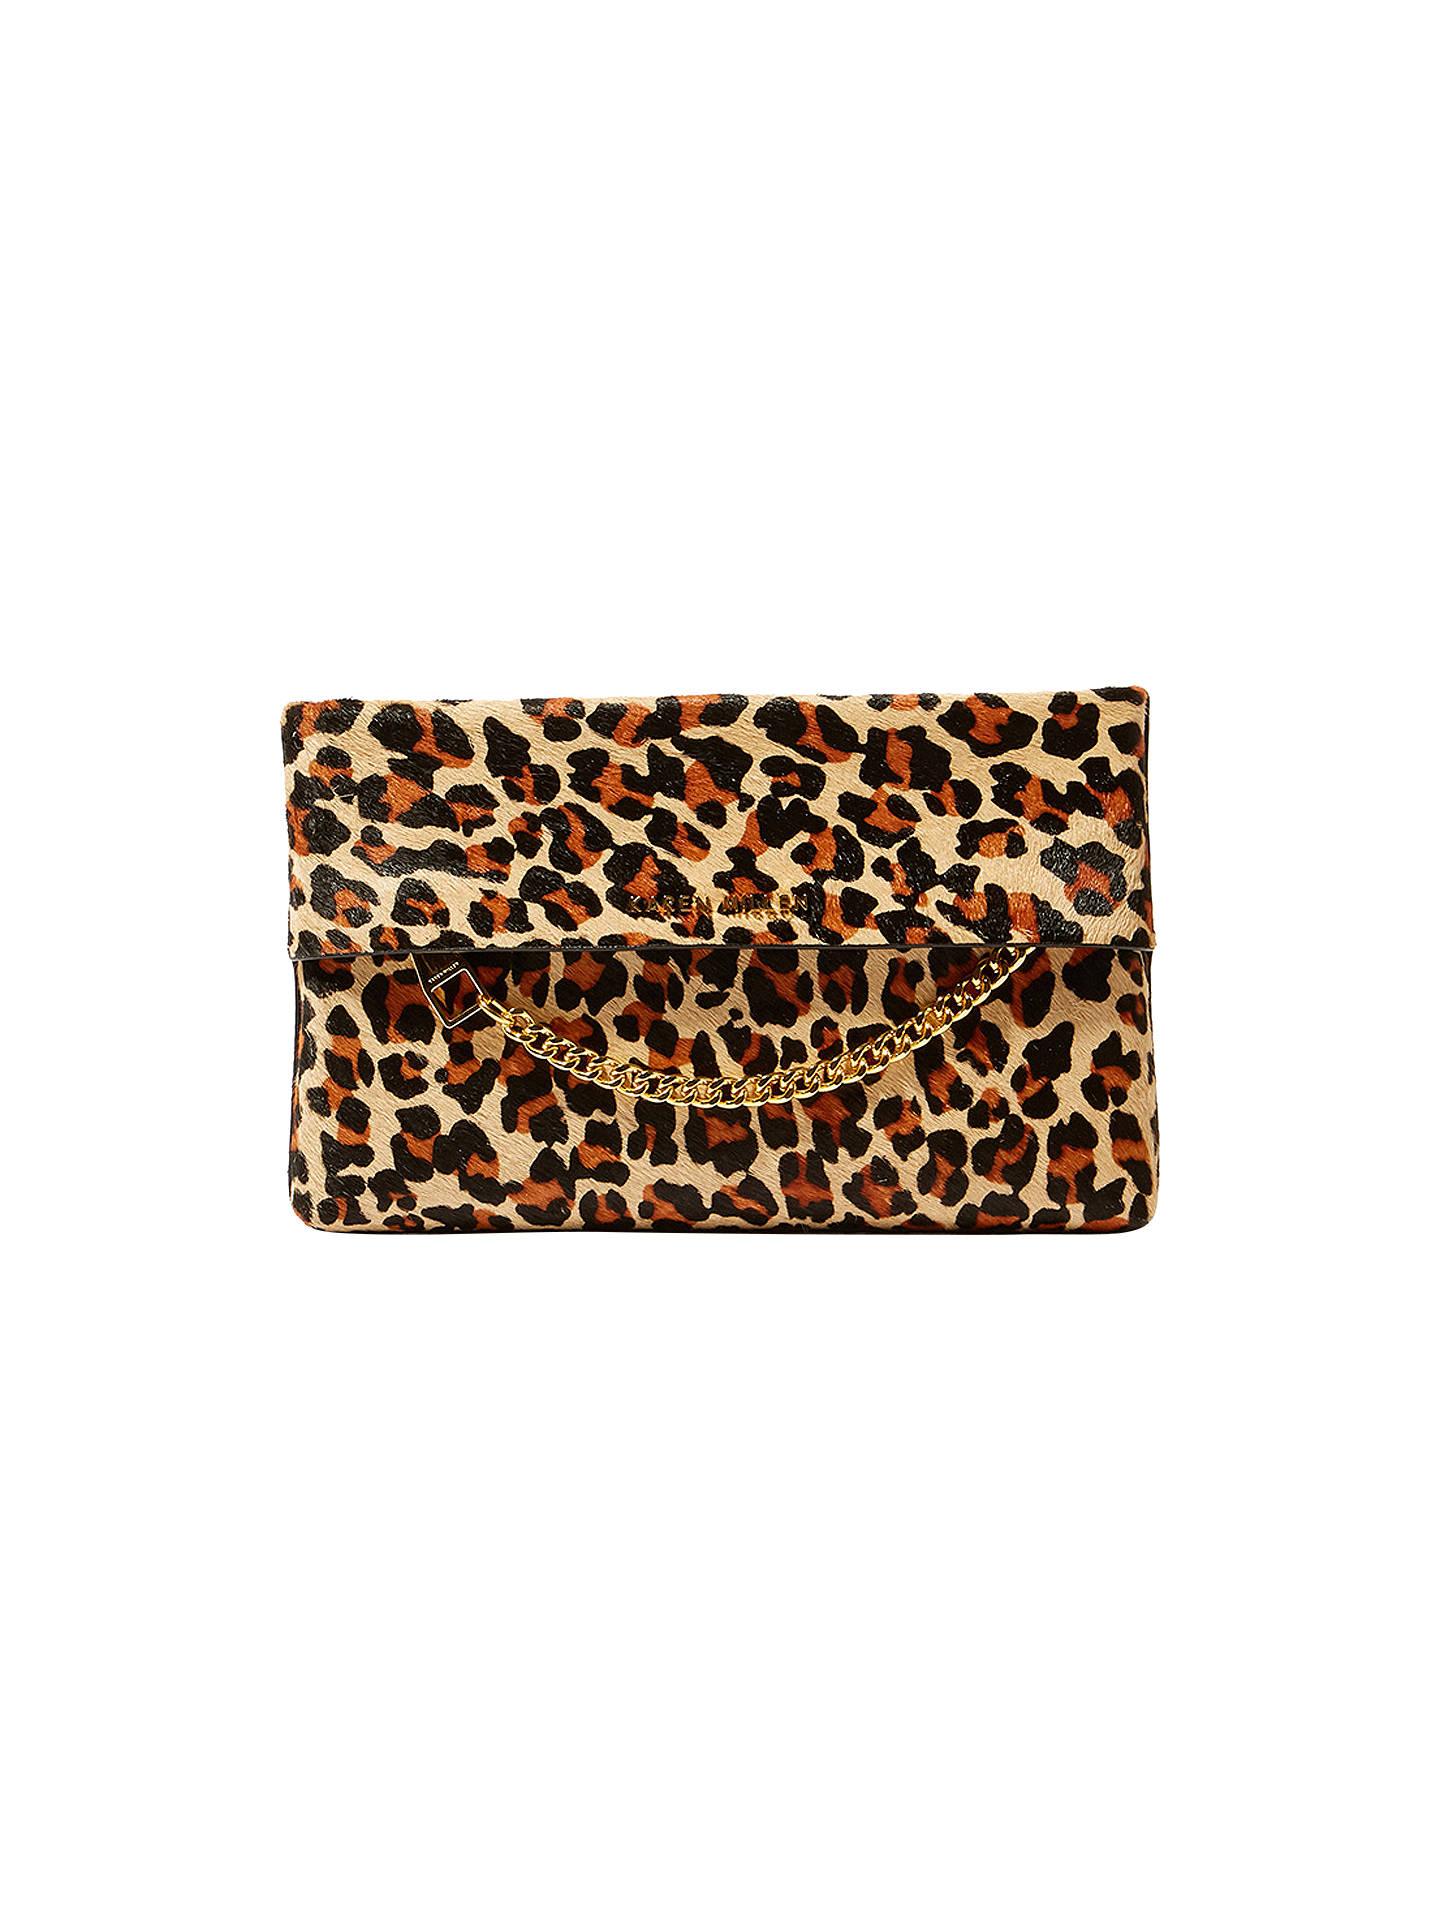 e9ee7f35456e Buy Karen Millen Leather Chain Zip Clutch Bag, Leopard Print Online at  johnlewis.com ...